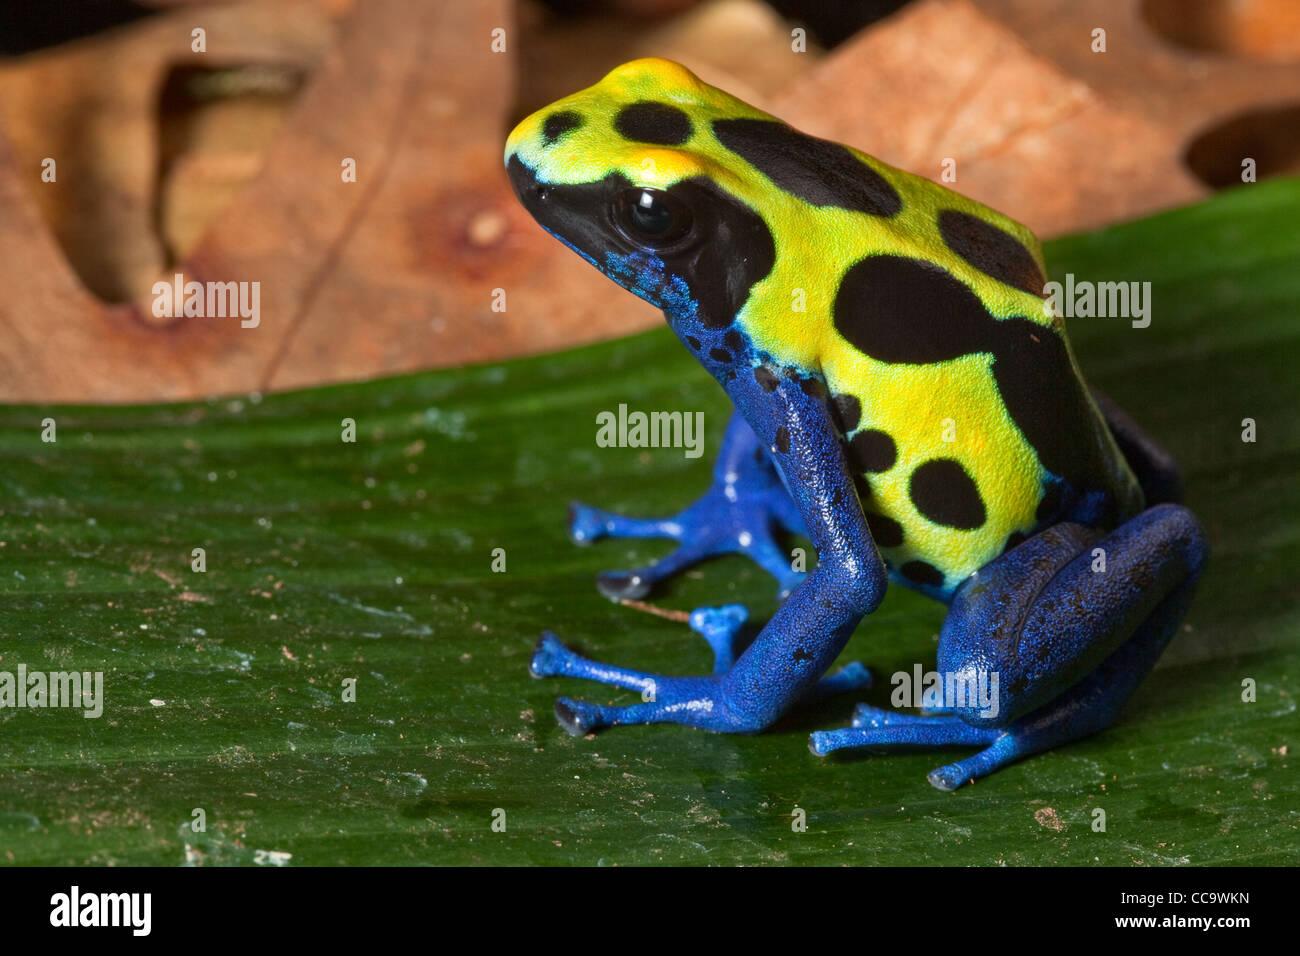 Deying poison dart frog, Dendrobates tinctorius, Amazon rain forest Suriname. A beautiful blue poisonous tropical - Stock Image